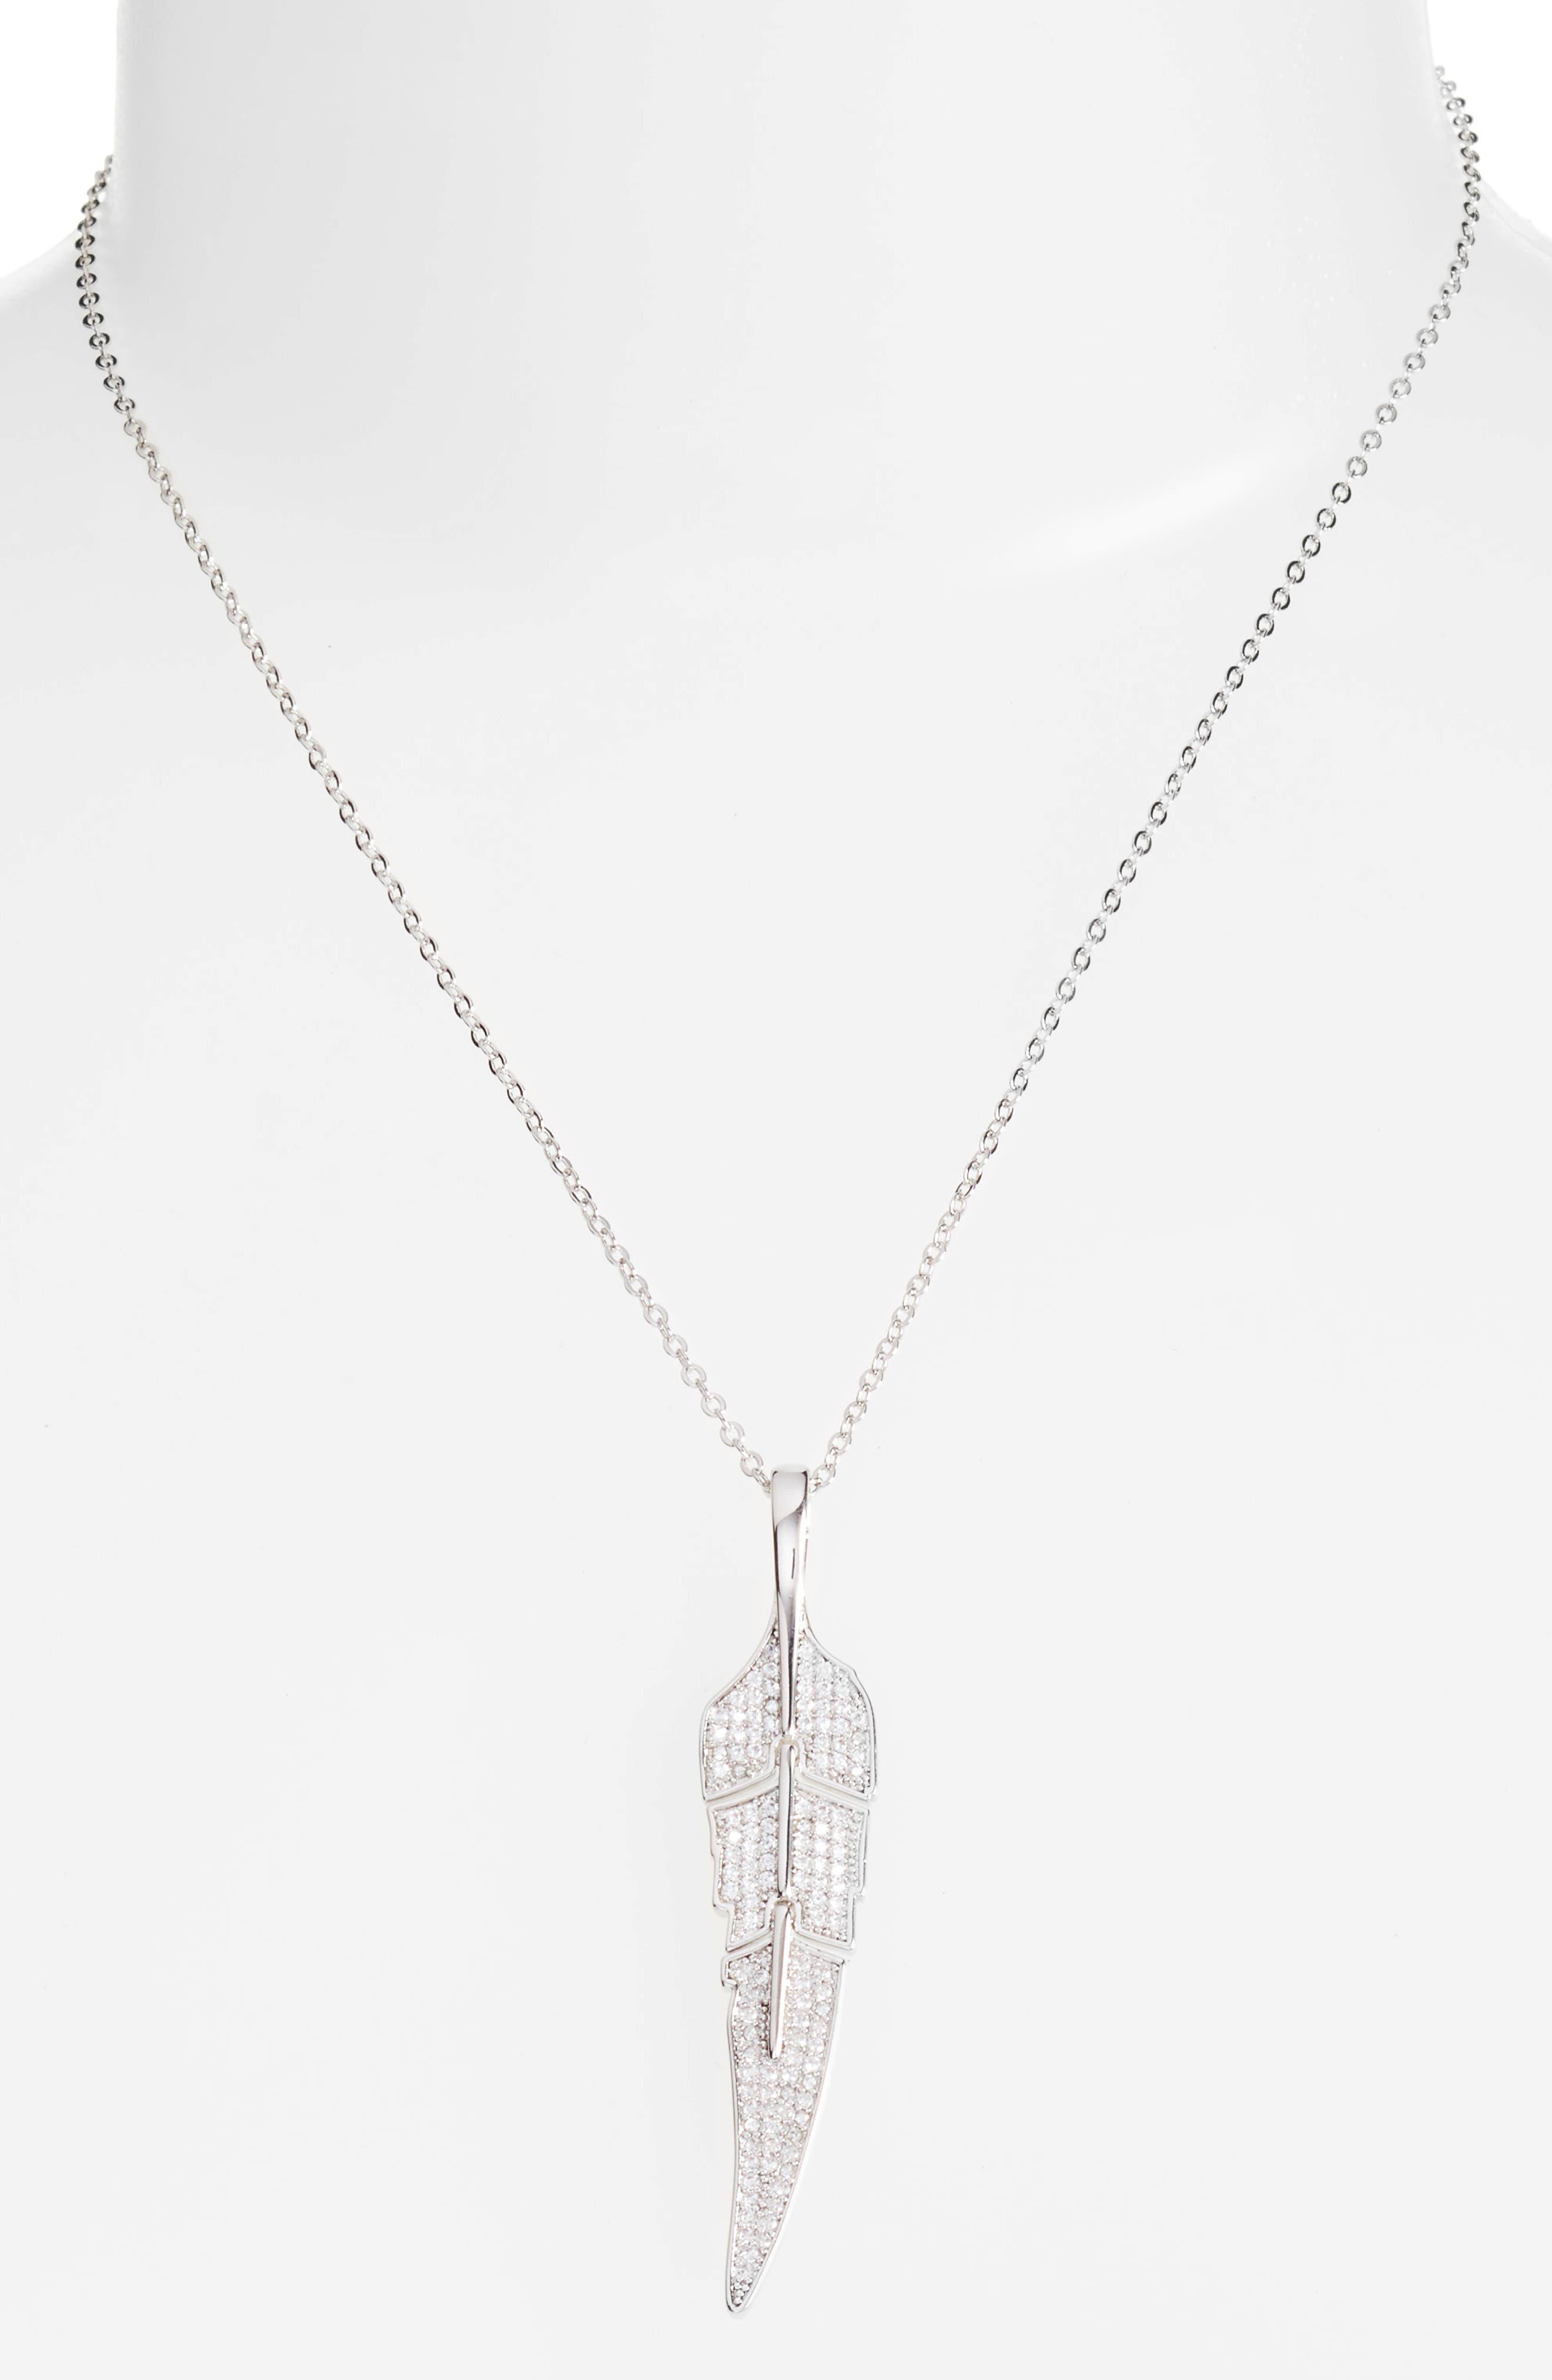 Feather Pendant Necklace,                             Main thumbnail 1, color,                             040